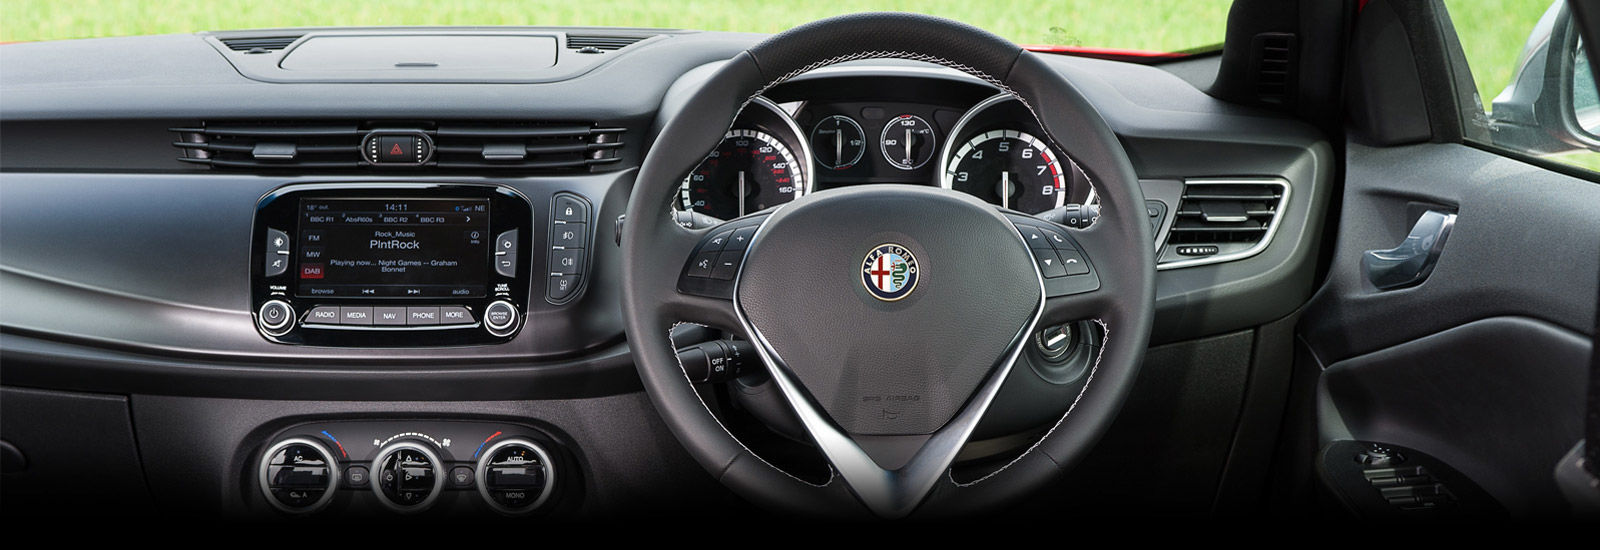 Alfa Romeo Giulietta facelift: old vs new | carwow